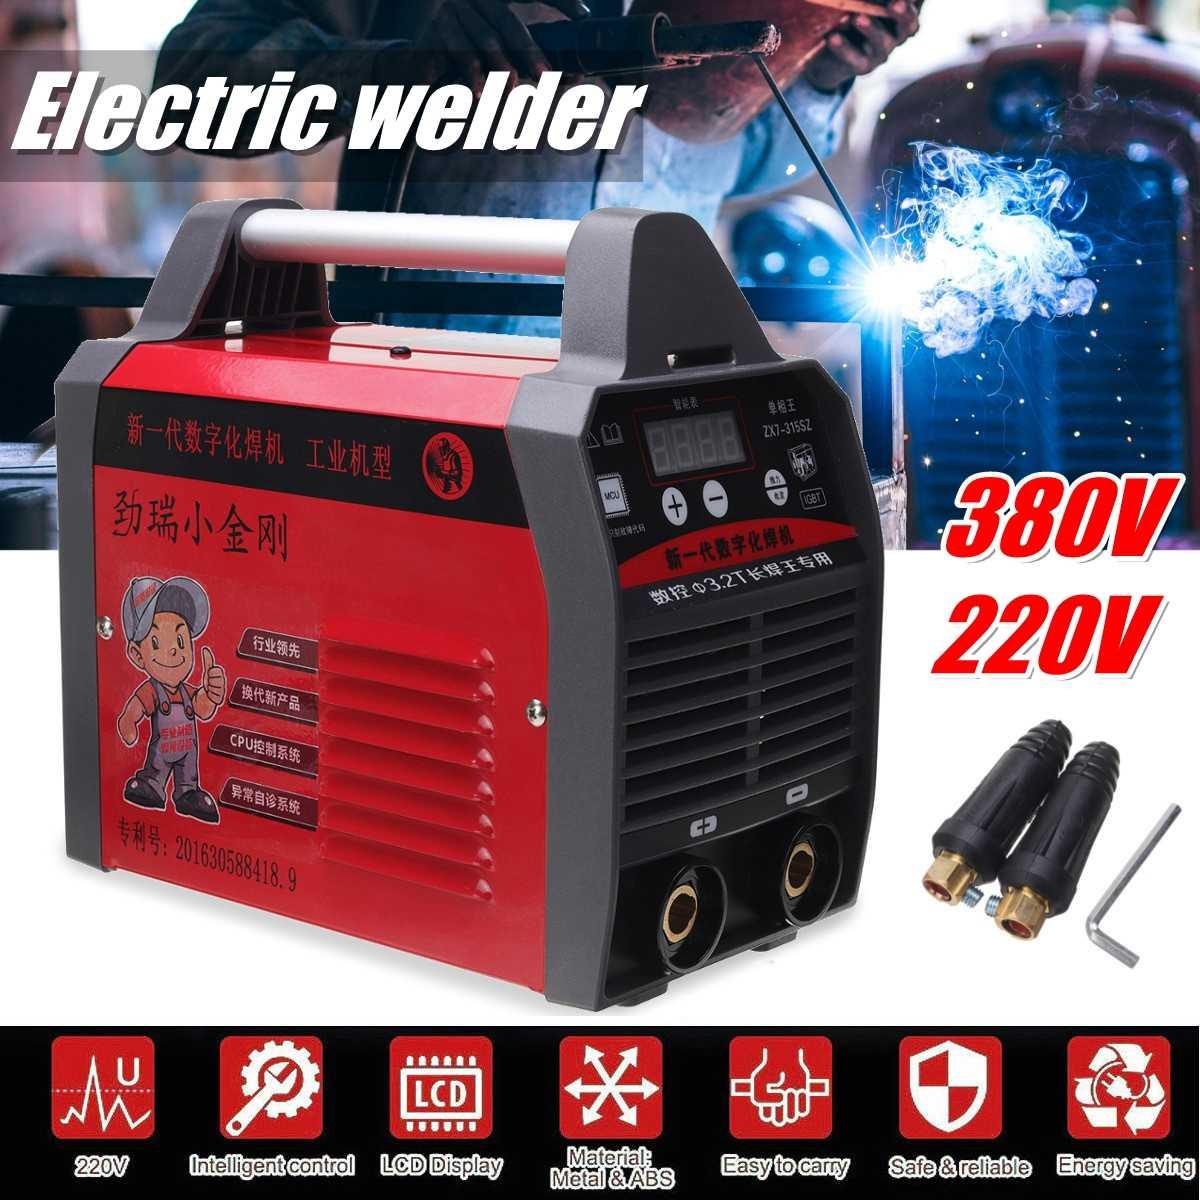 LWQ Arc Welder,2In1 ARC//Inverter Arc Electric Welding Machine 220V 250A MMA Welders for Welding Working Electric Working Power Tools